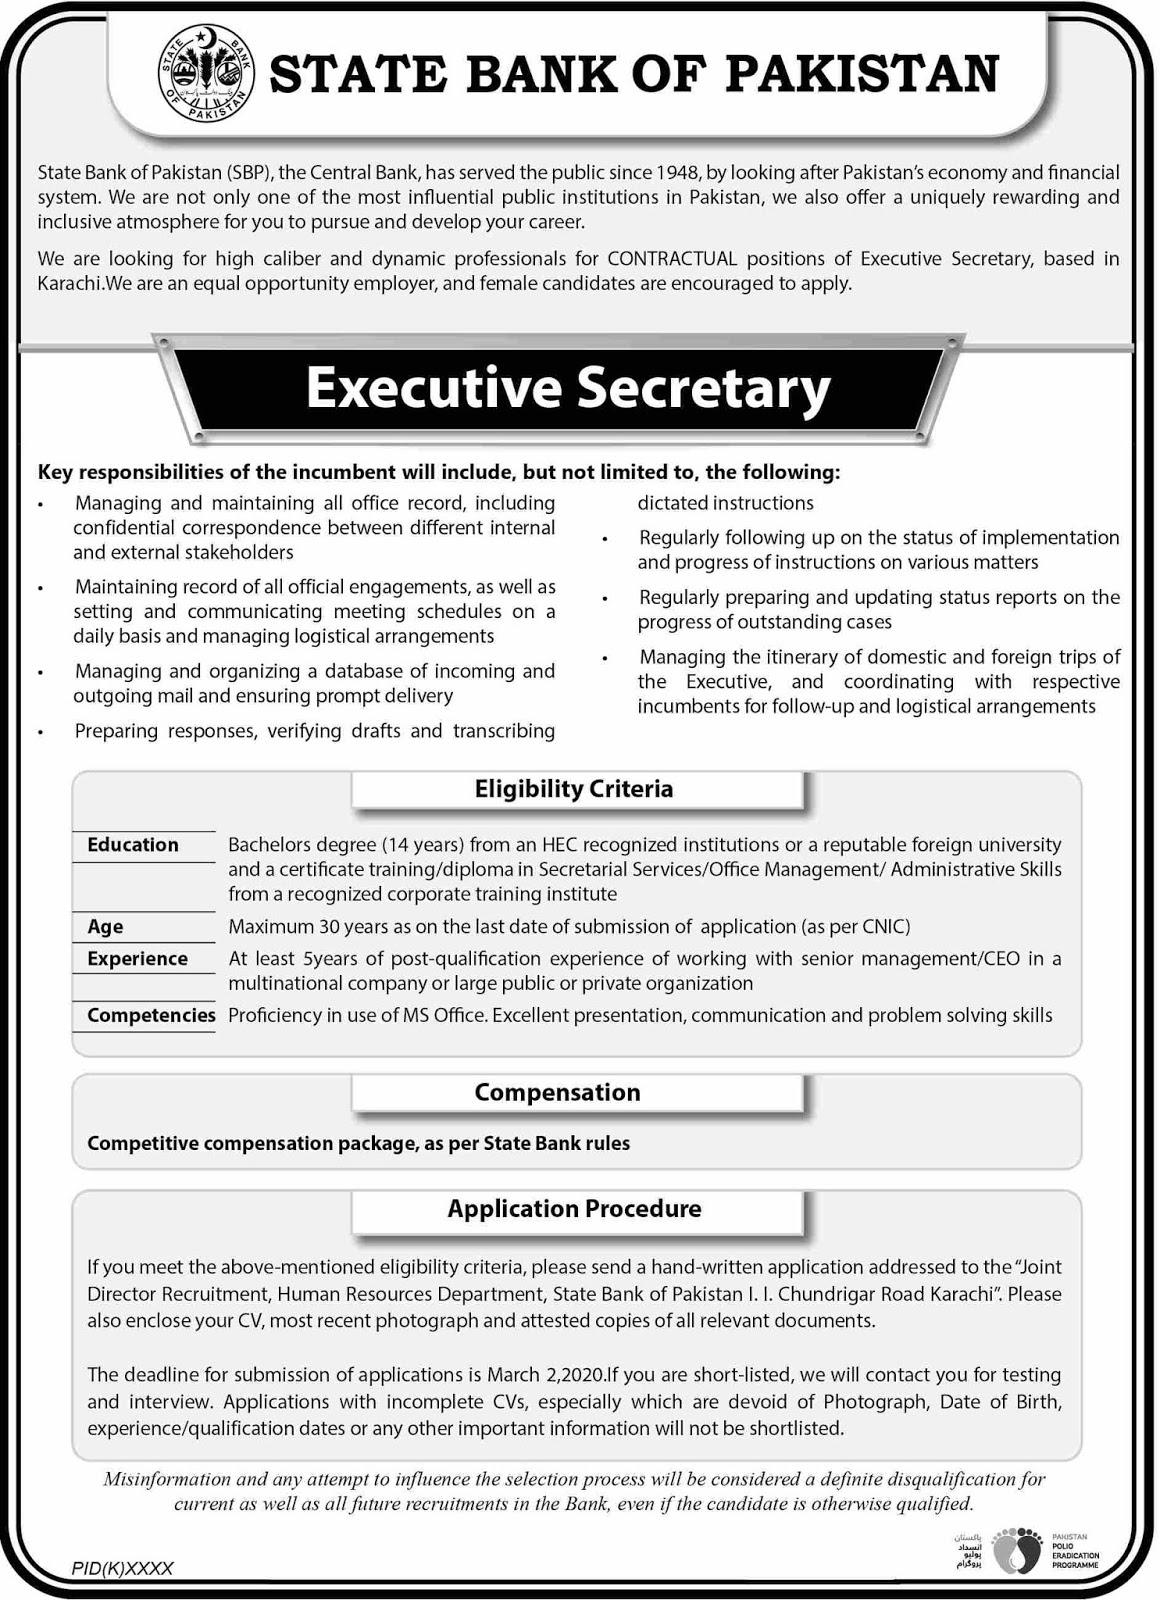 State Bank of Pakistan SBP Jobs 2020